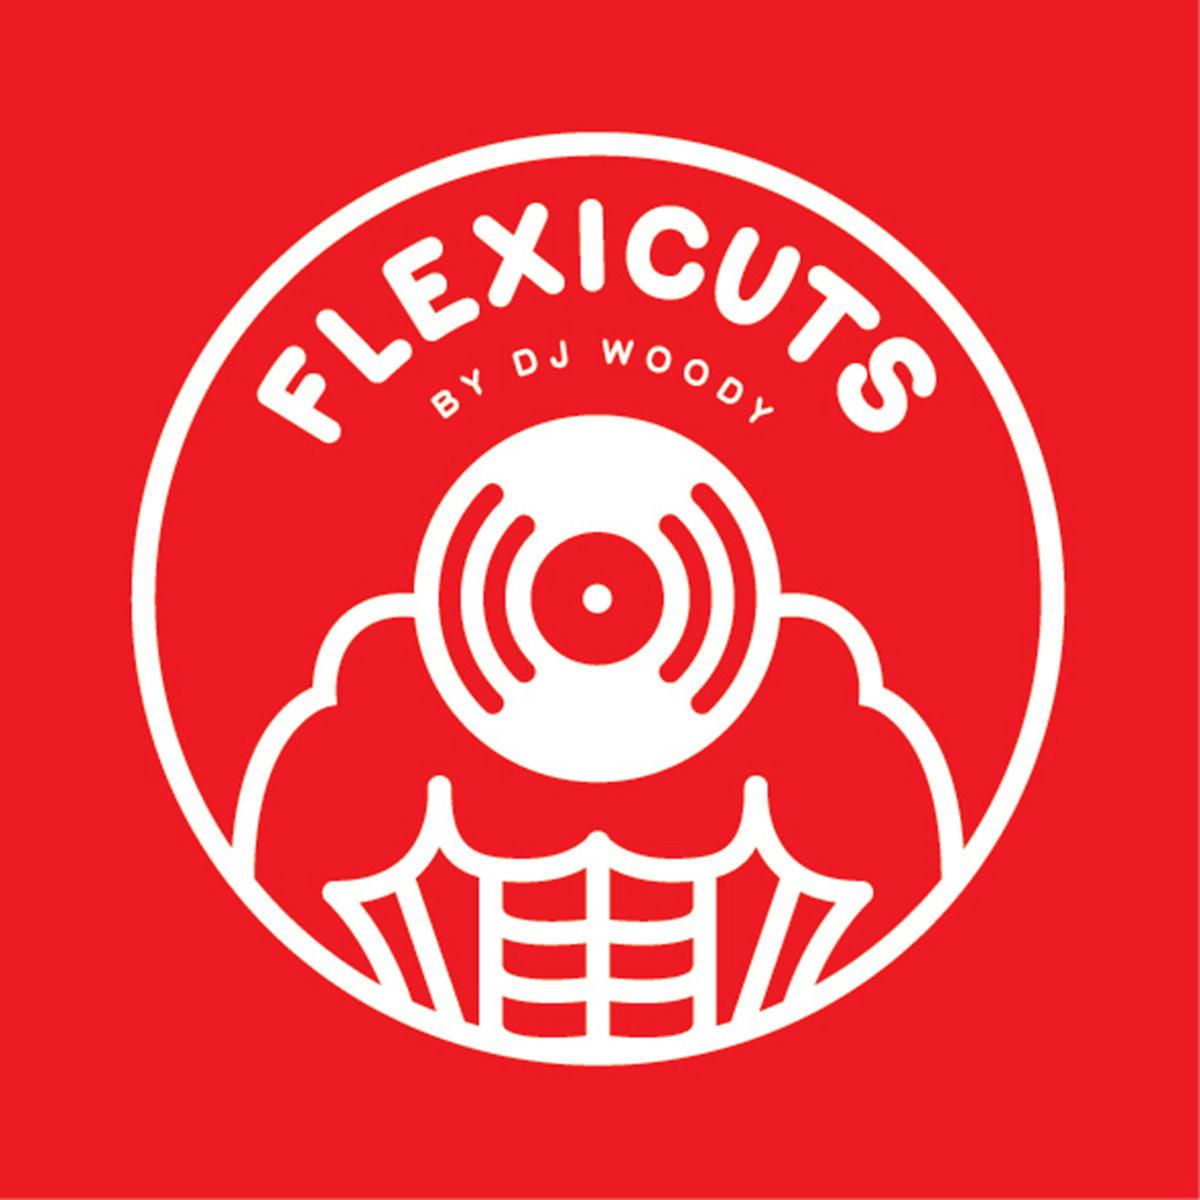 Flexicuts 1 | djwoodymusic